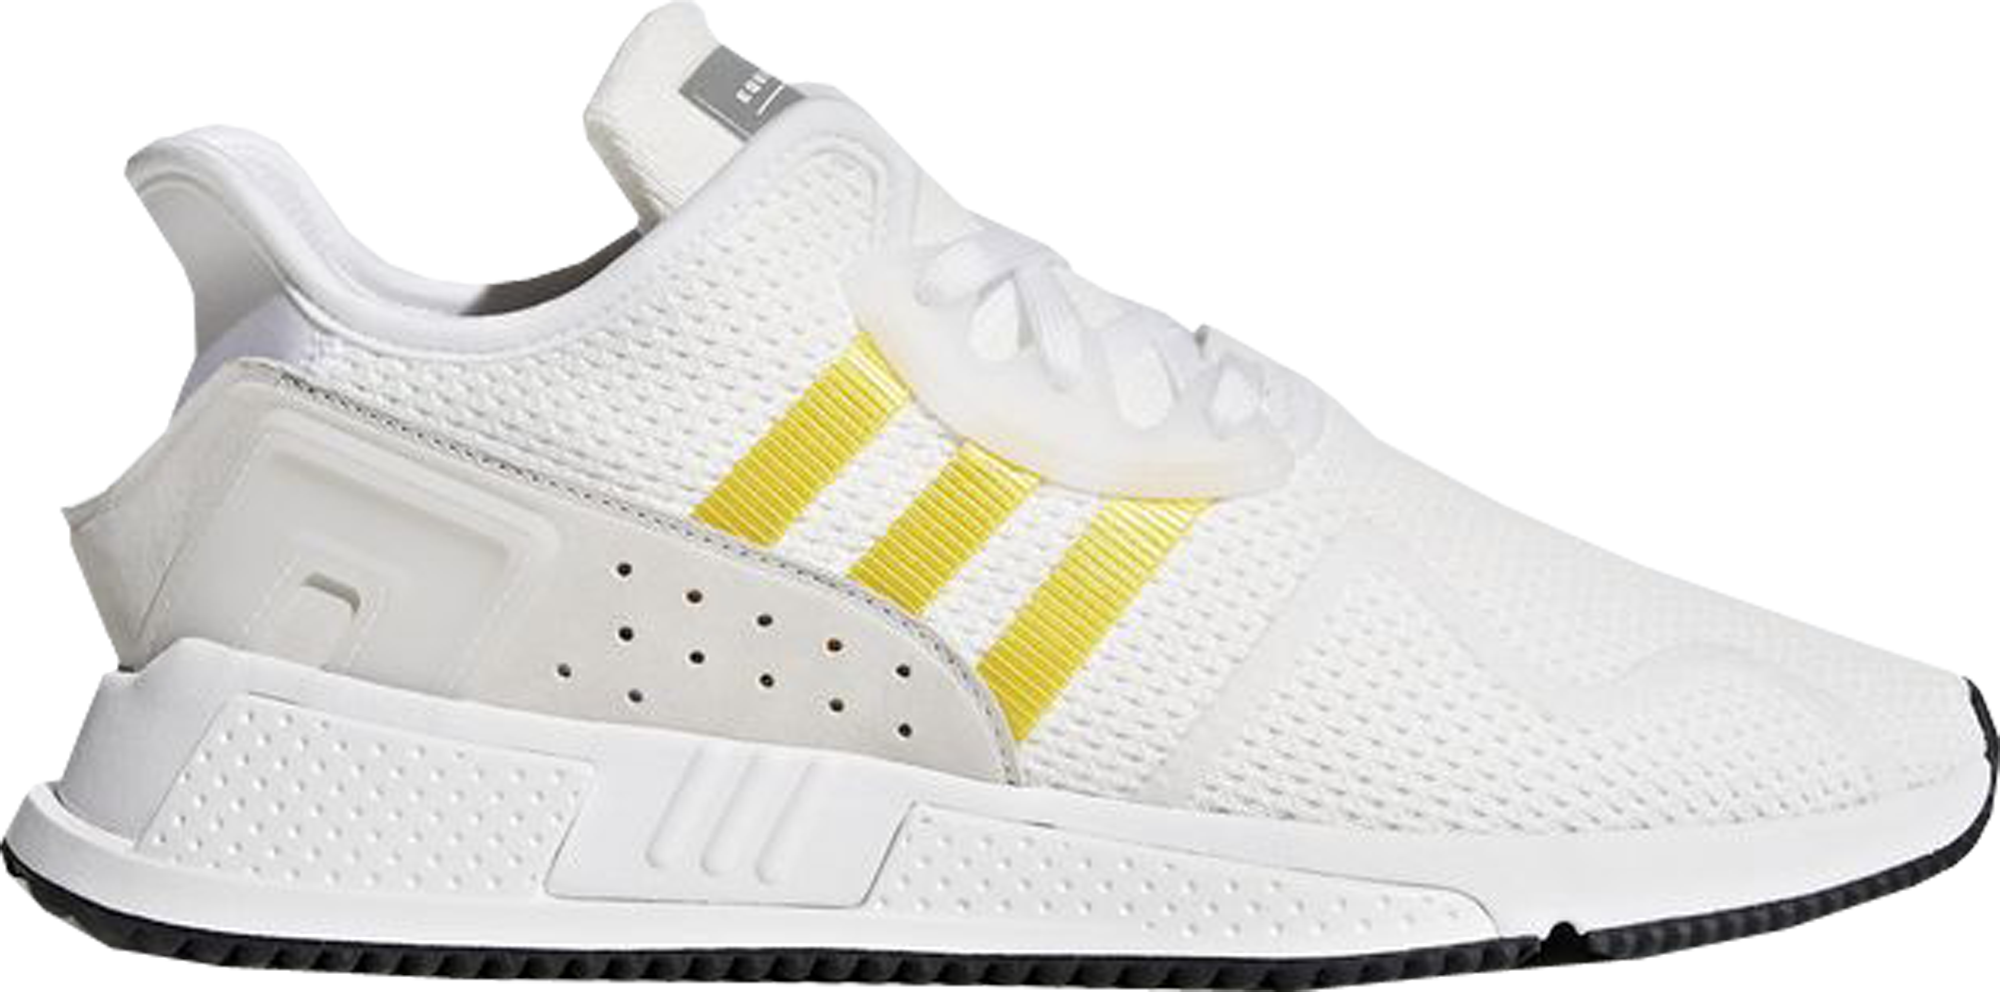 adidas EQT Cushion Adv White Equipment Yellow